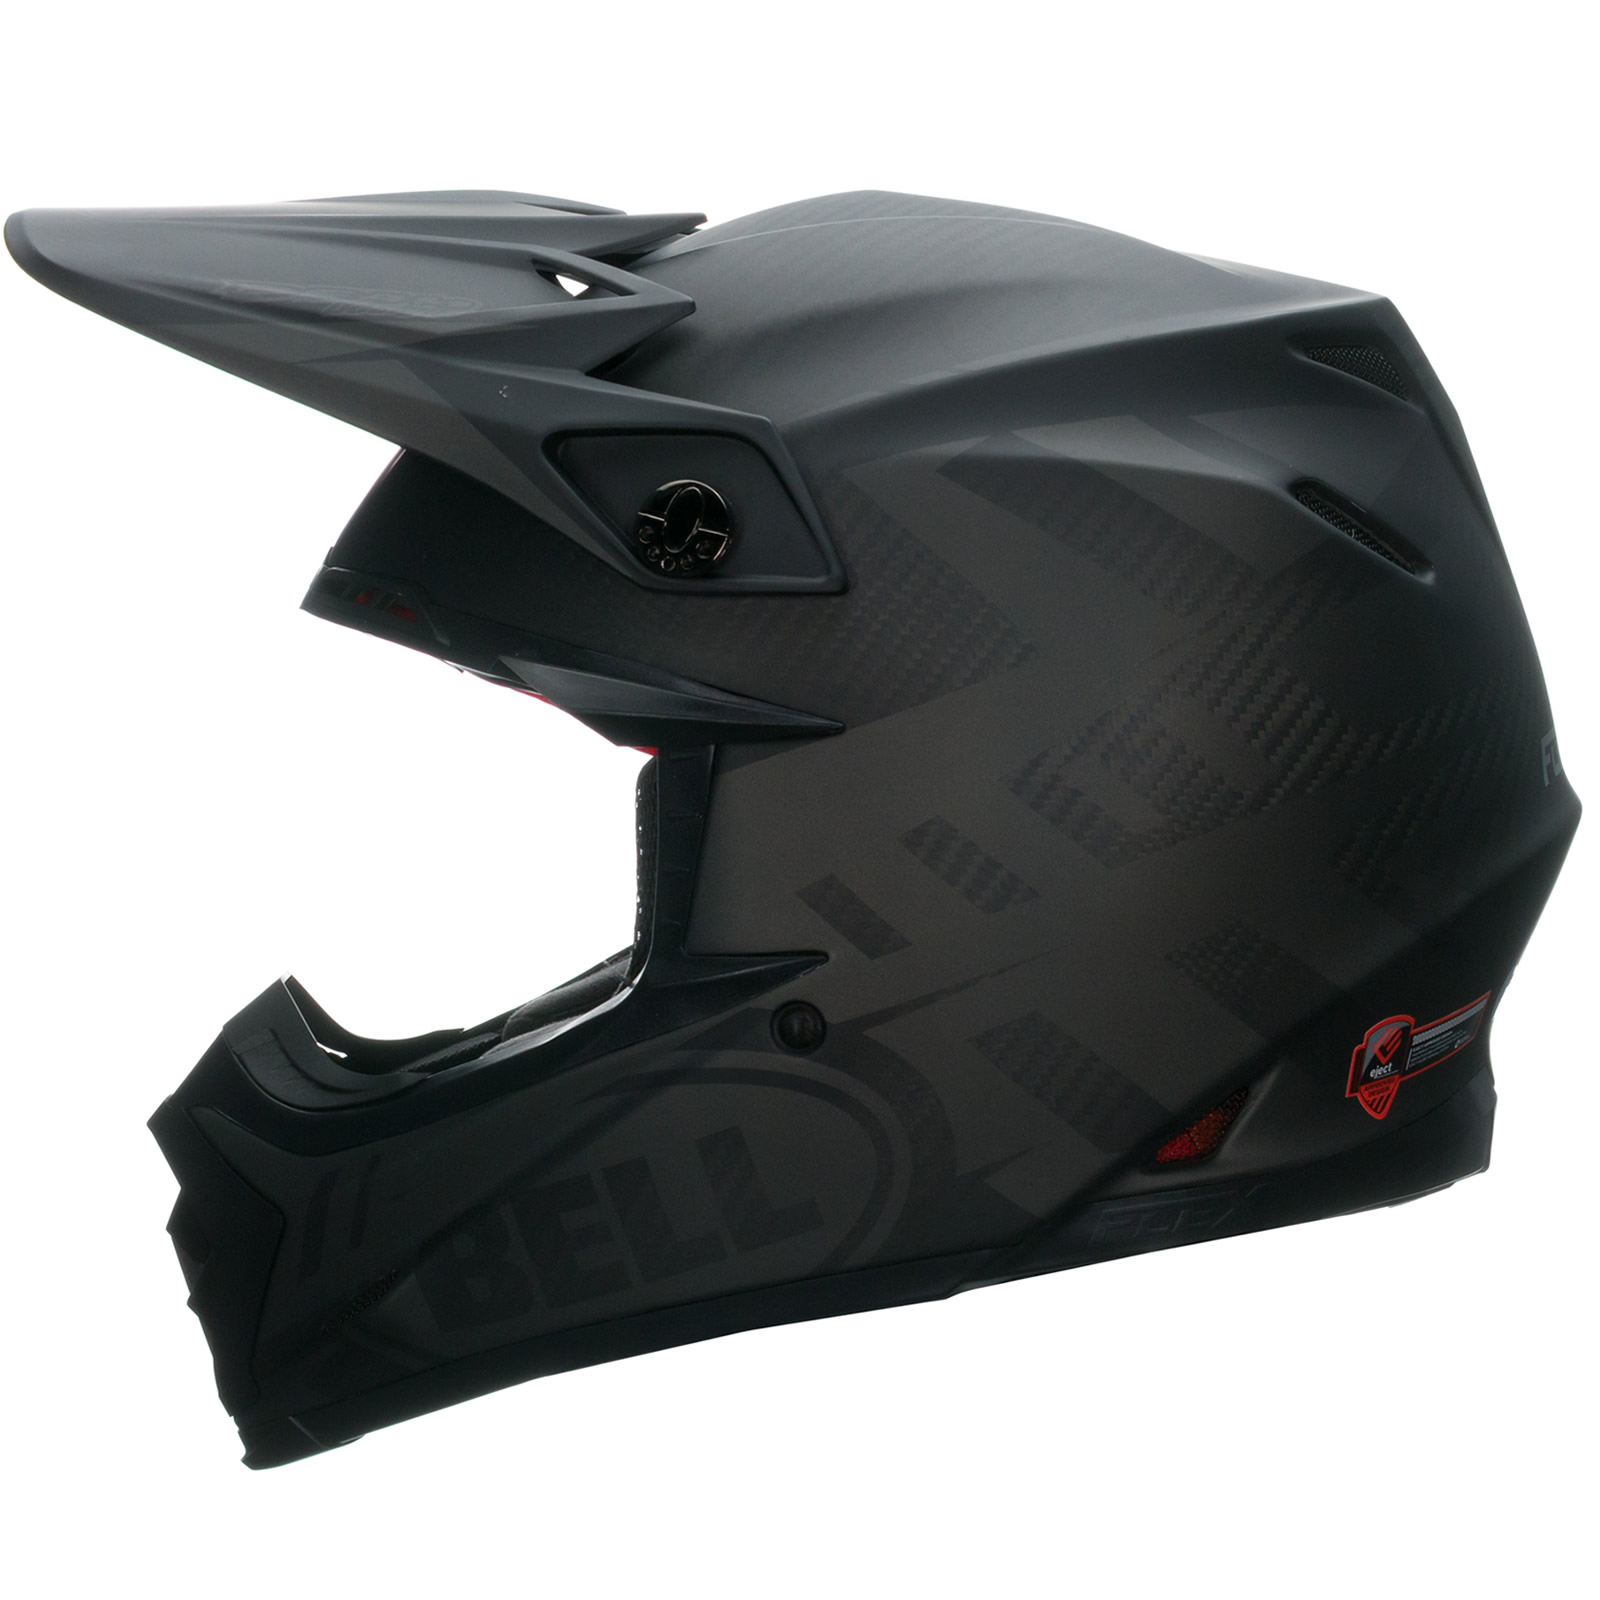 022a1e61 Bell Moto-9 Carbon Flex Syndrome Matt Black MX Cross Quad Motocross ...